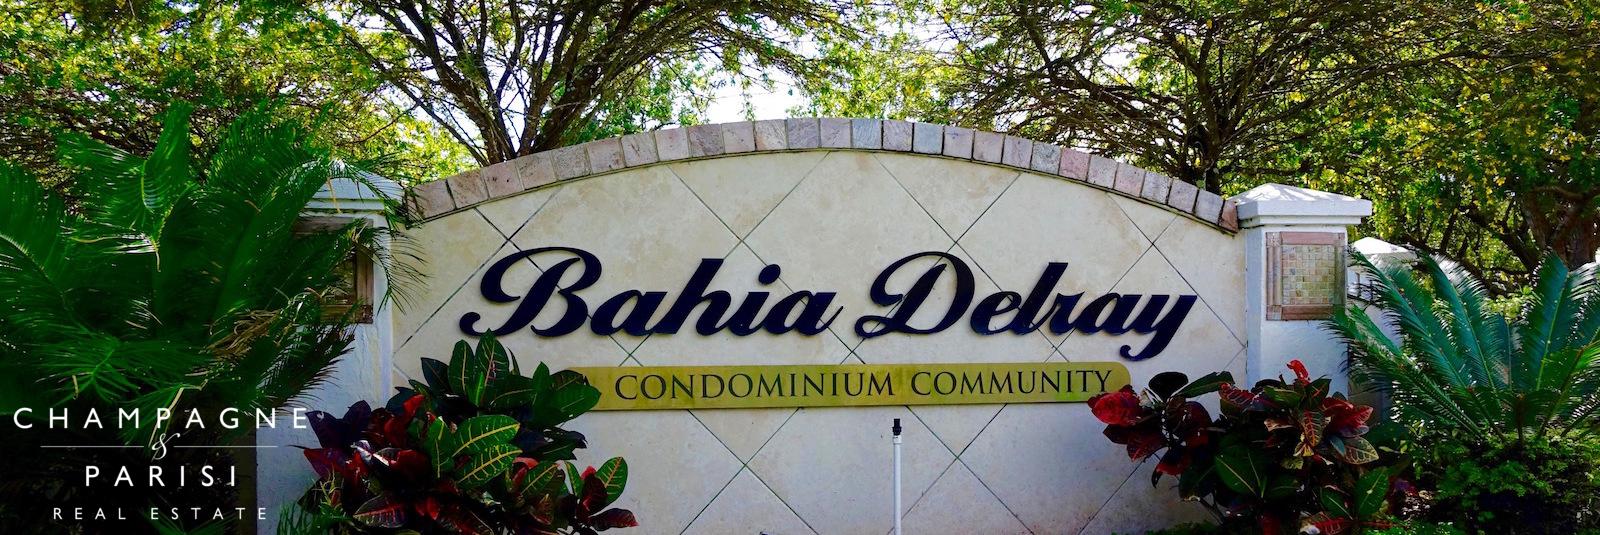 bahia delray entrance